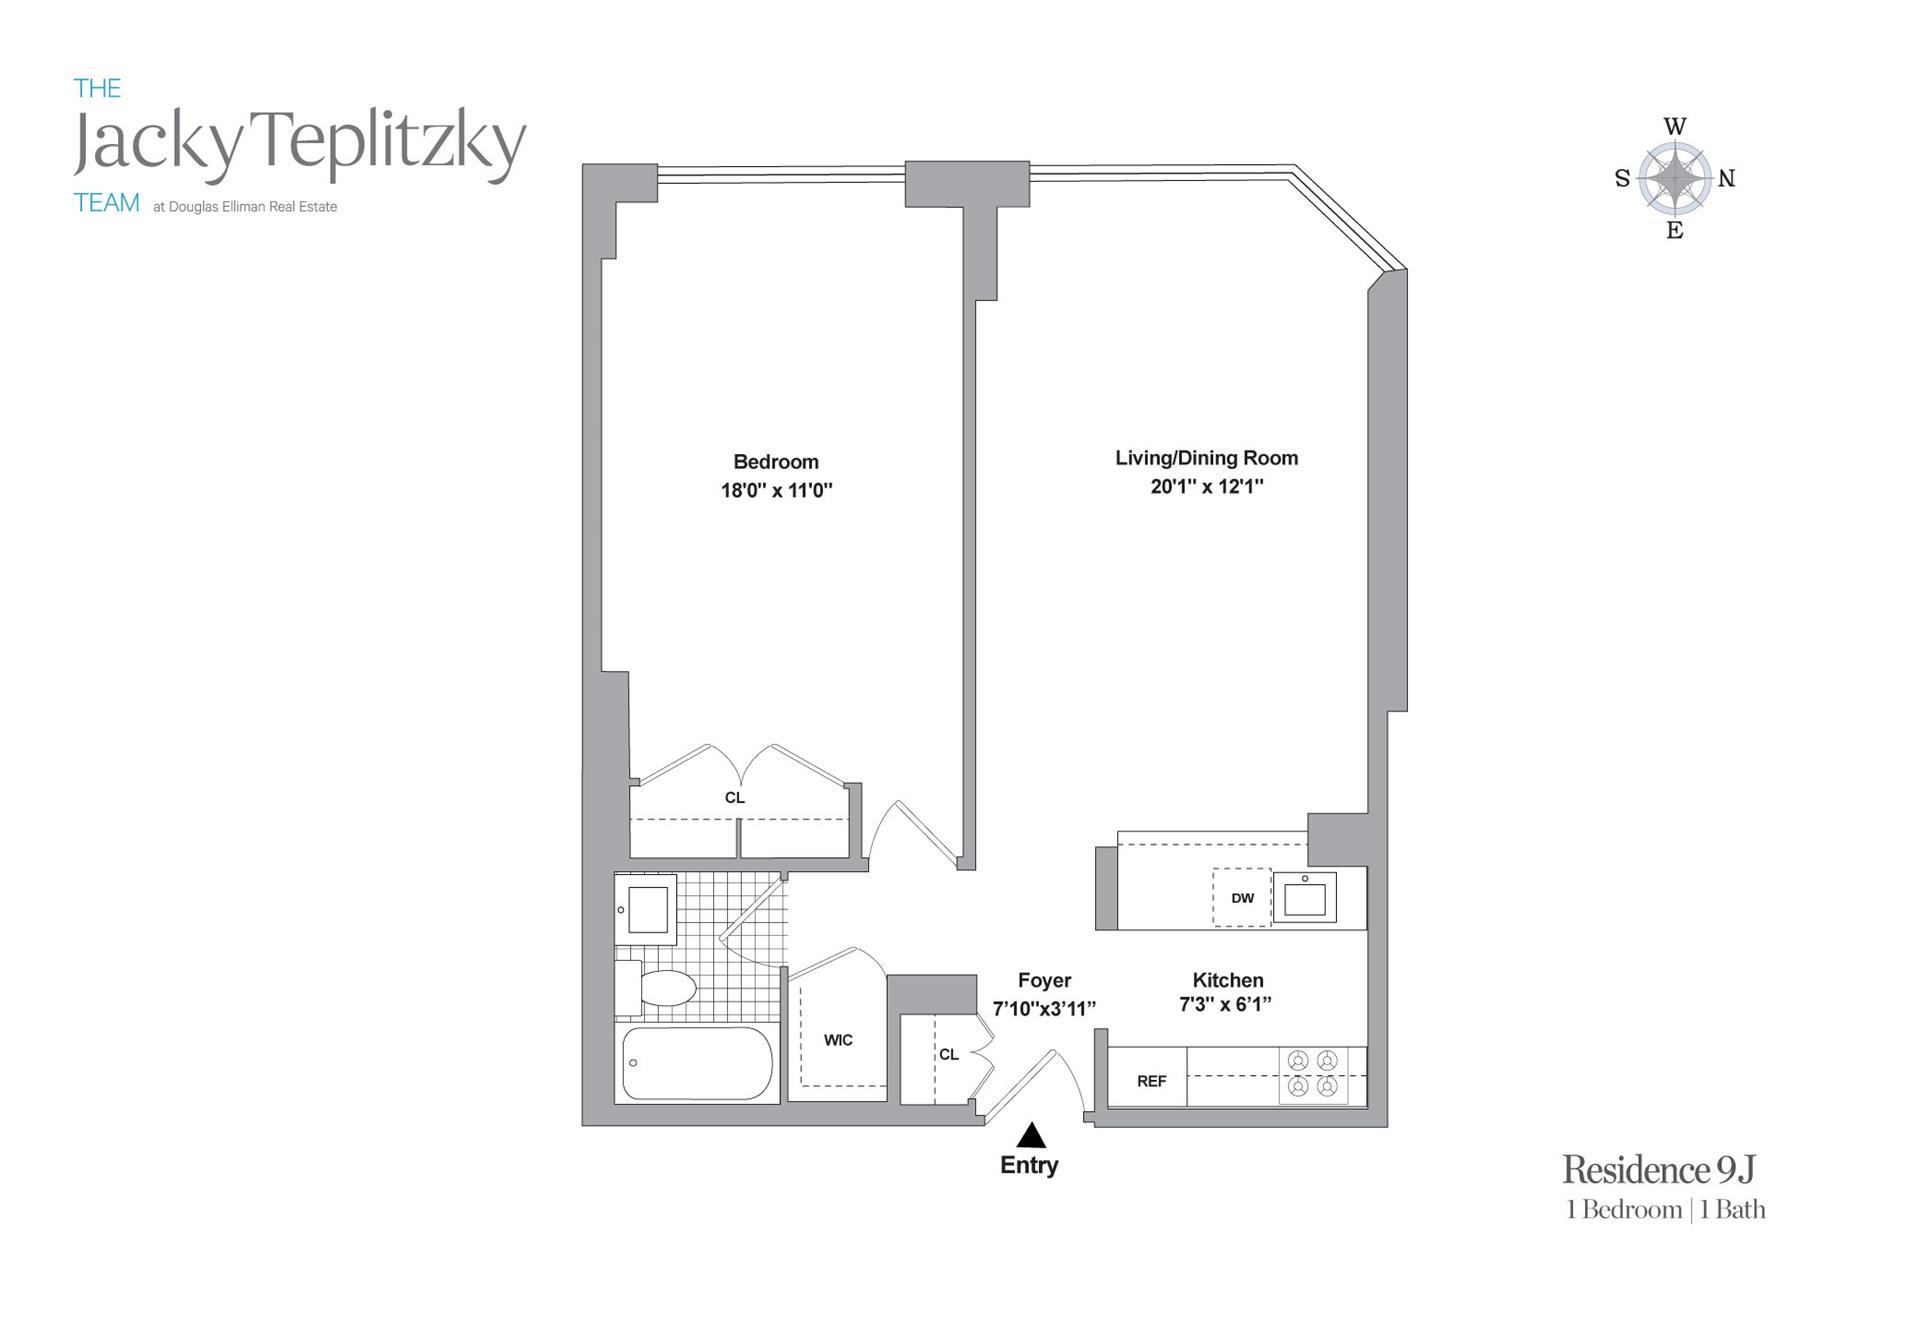 Floor plan of 215 West 95th Street, 9J - Upper West Side, New York